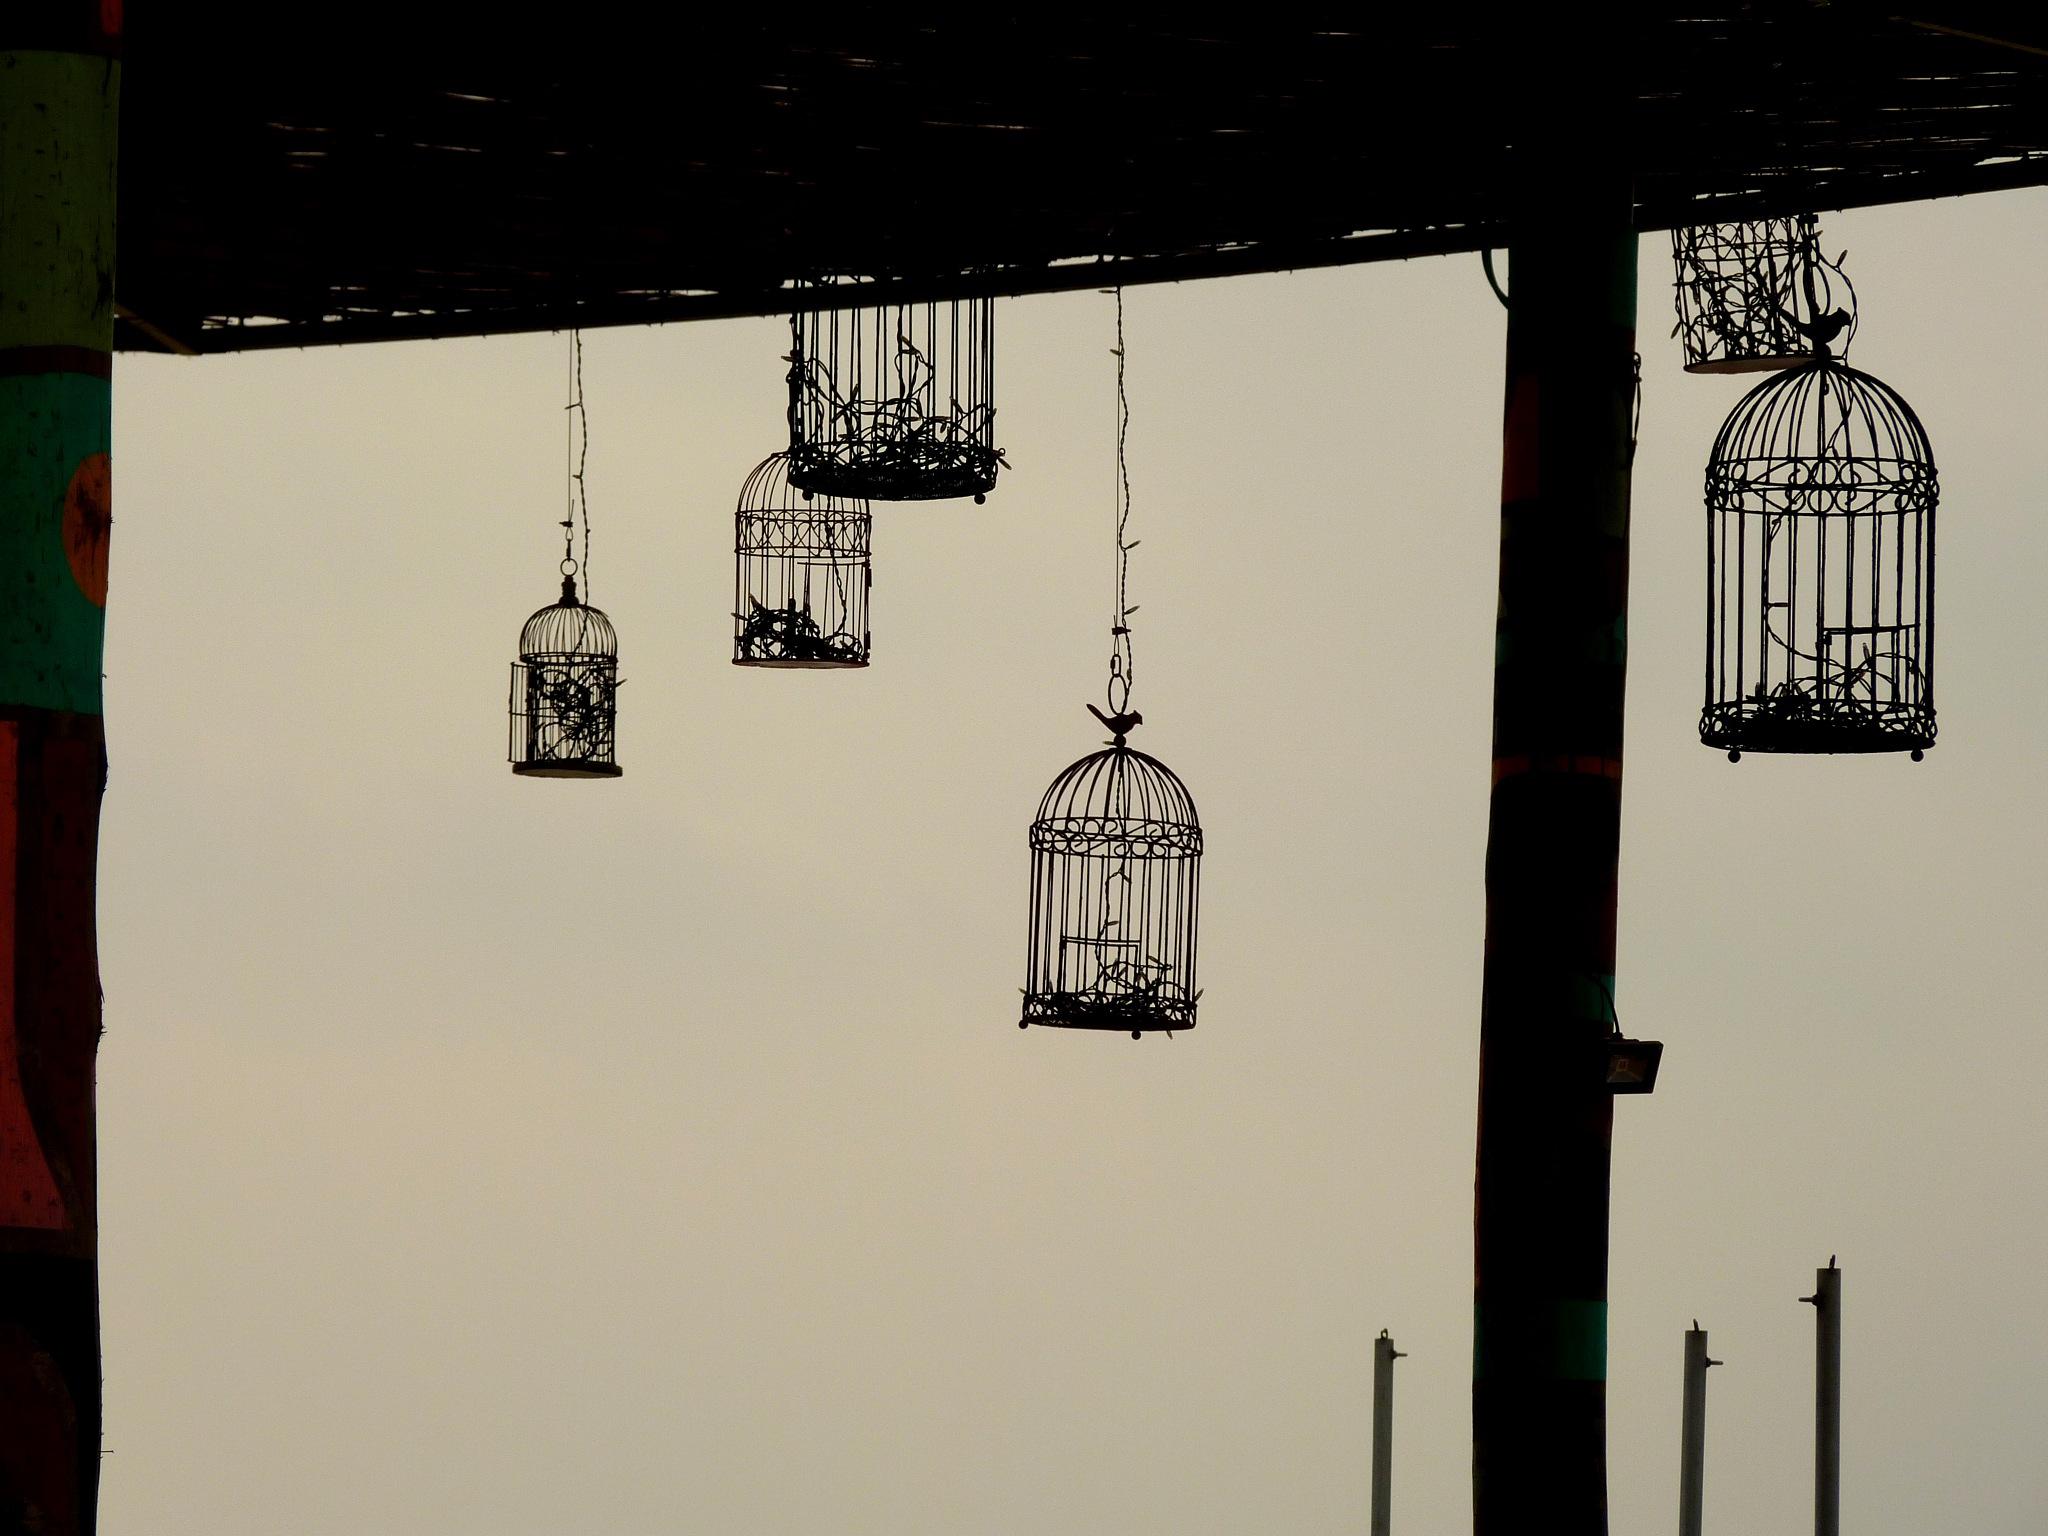 The birds flew 2 by Robert Julian